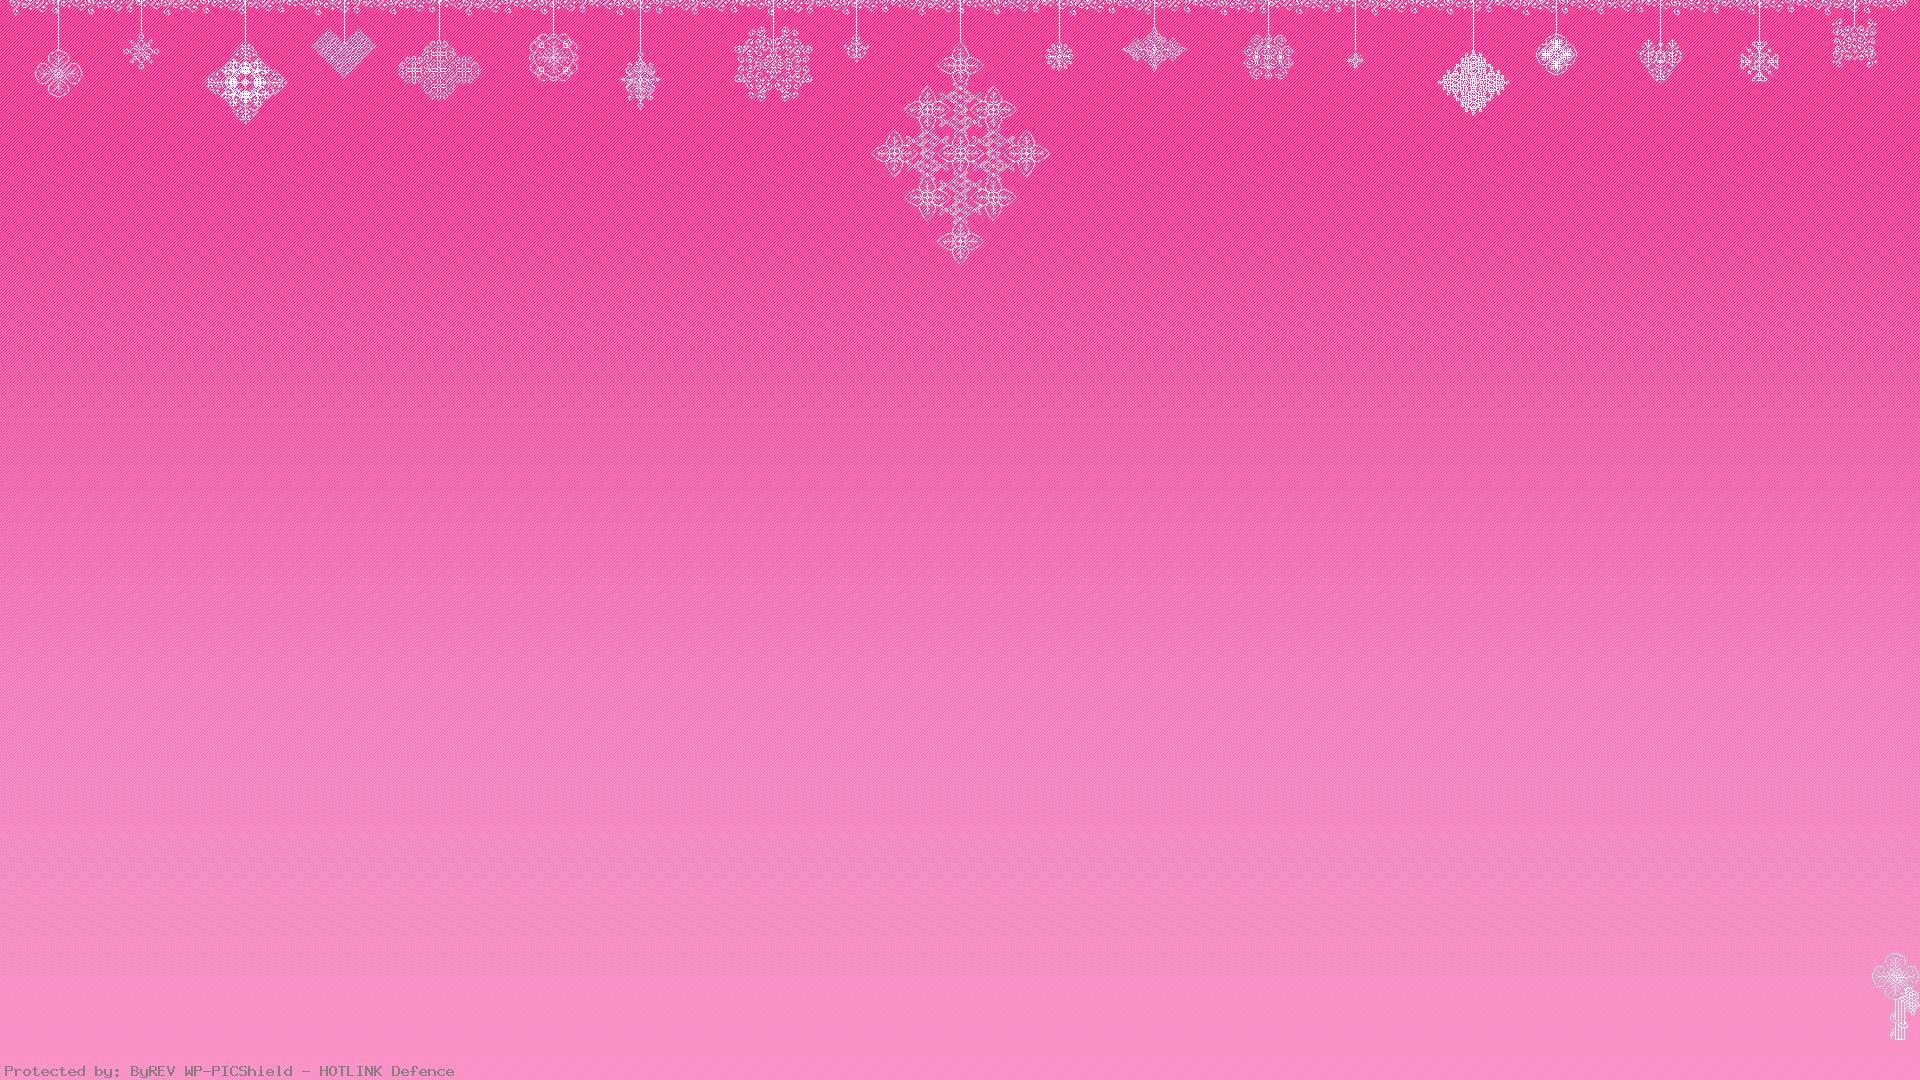 Pink Camo Computer Wallpaper (54+ Images